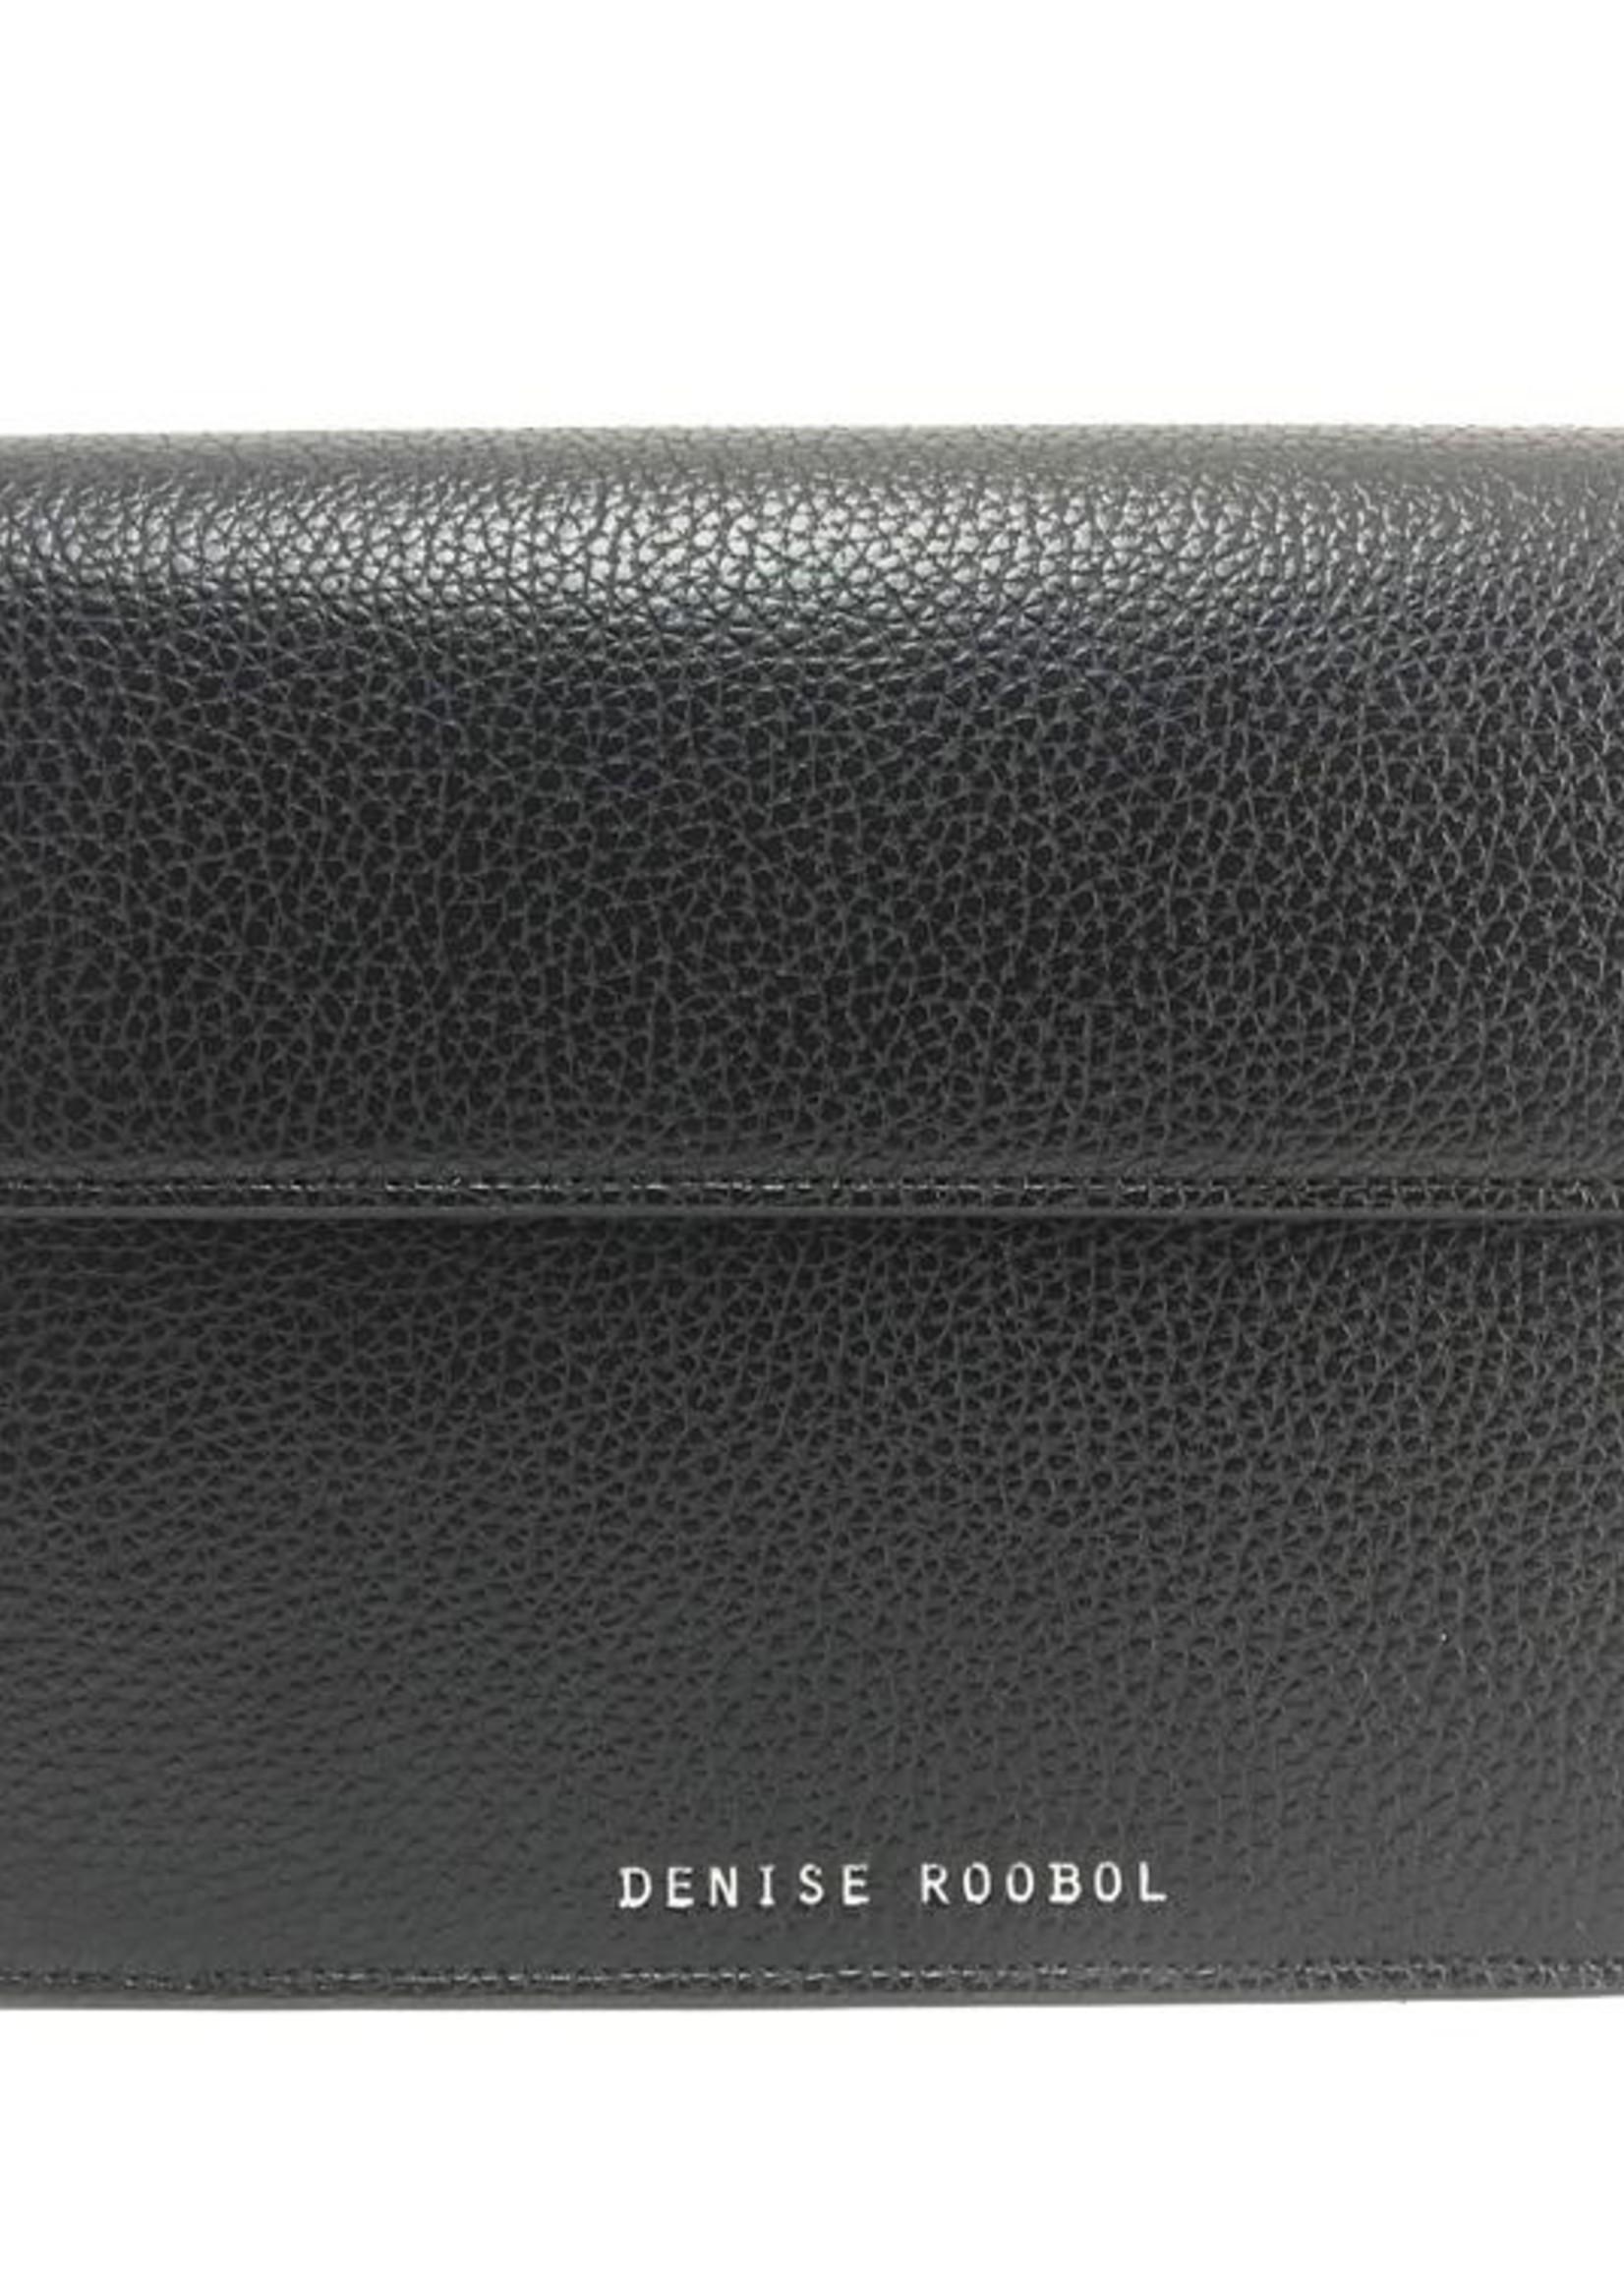 Denise Roobol Denise Roobol- Mini Nikki Bag - Black- Vegan